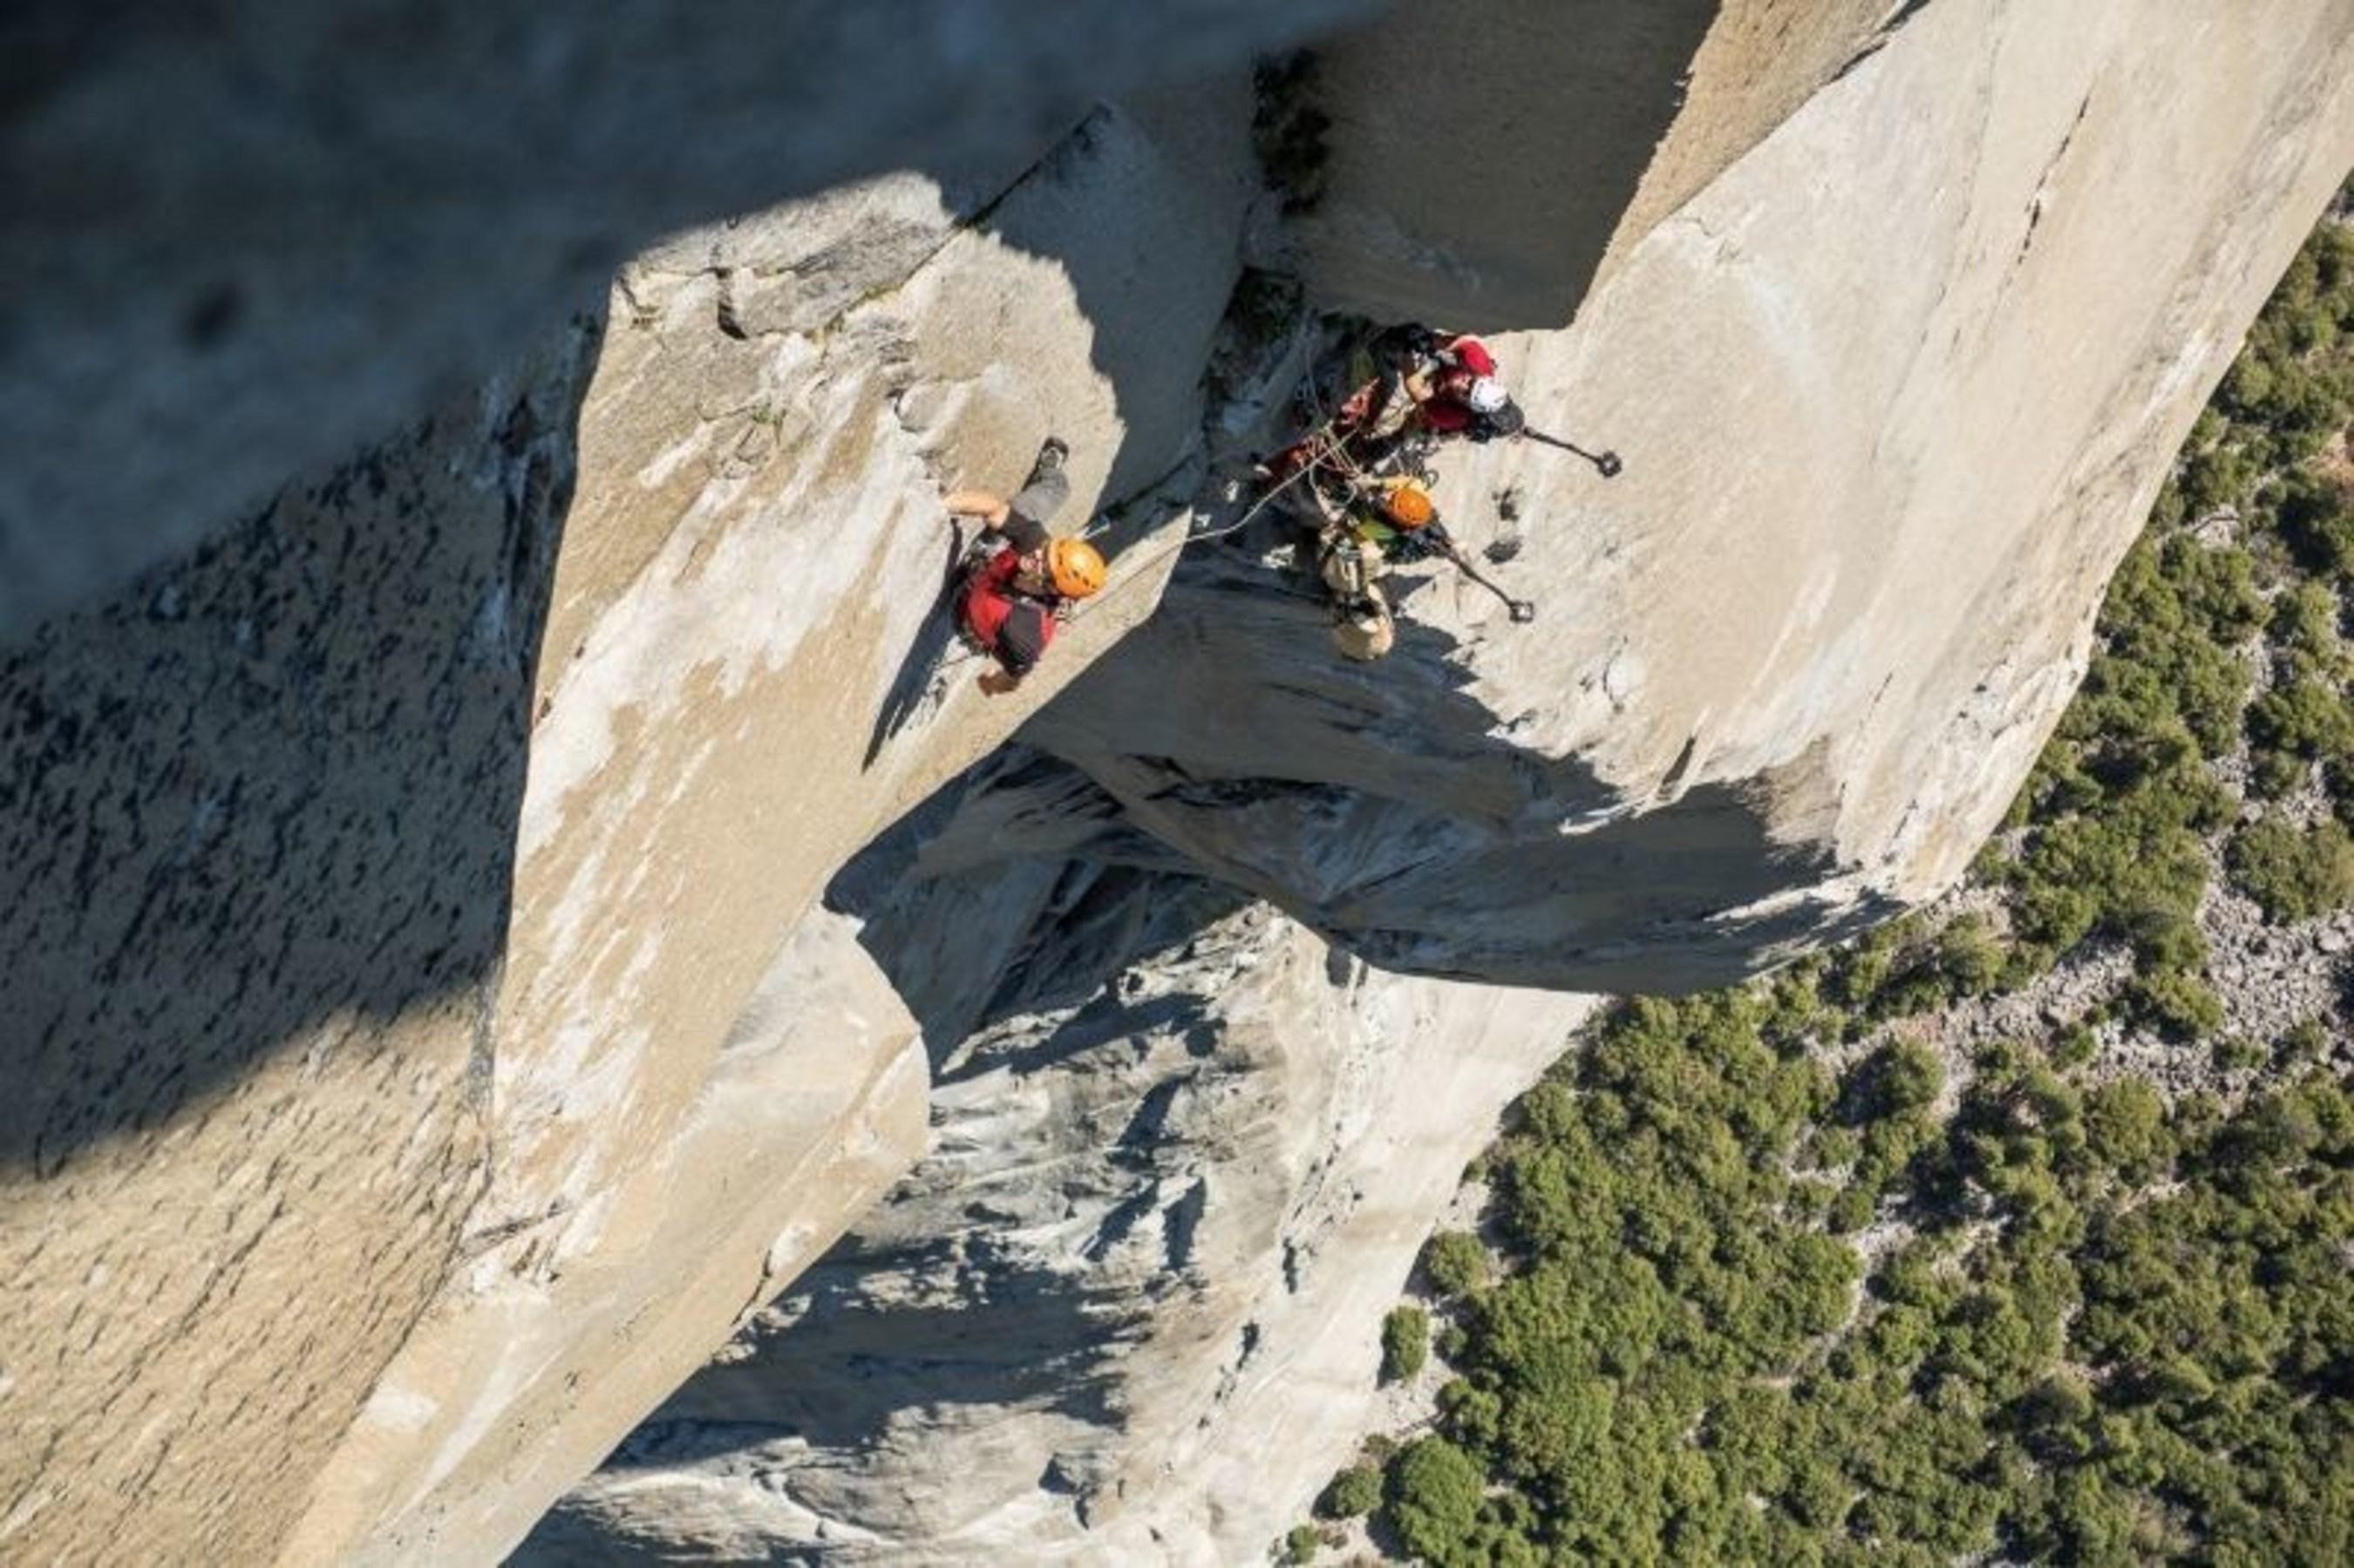 Mammut #PROJECT360 - Haciendo gala de cinco escaladas espectaculares